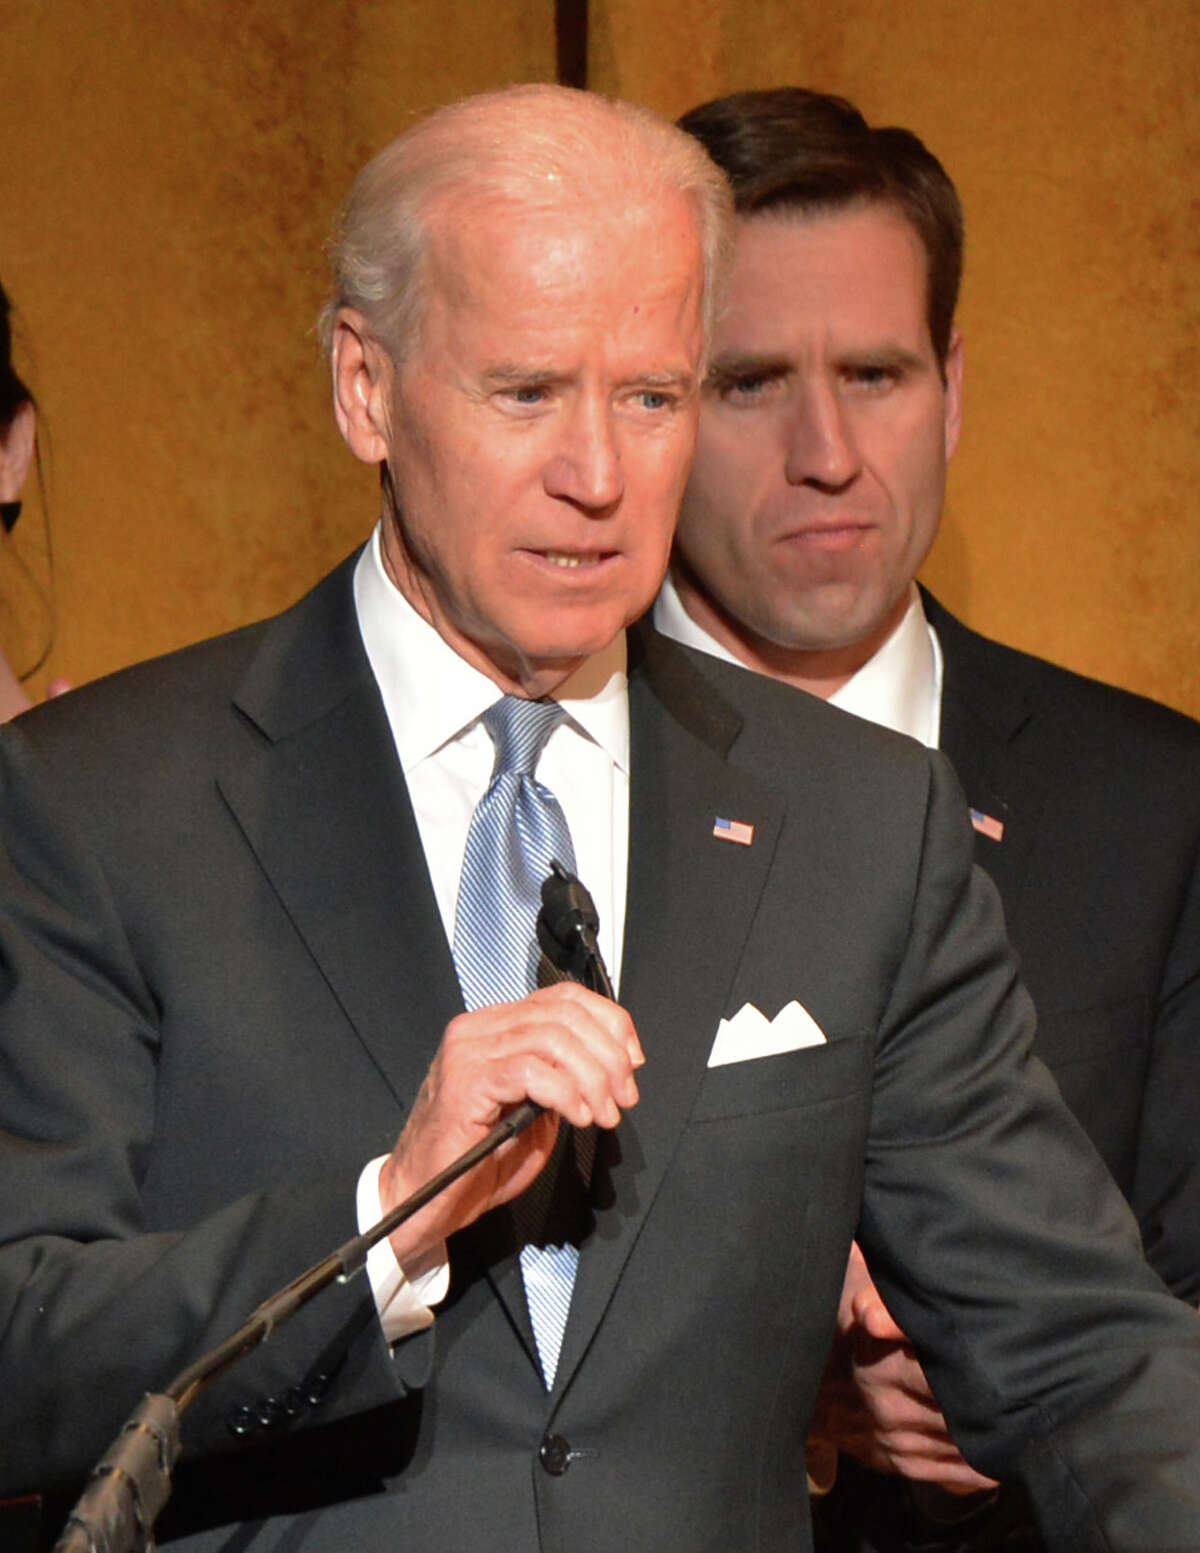 WASHINGTON, DC - JANUARY 20: U.S. Vice President Joe Biden speaks at Latino Inaugural 2013: In Performance at Kennedy Center at The Kennedy Center on January 20, 2013 in Washington, DC.